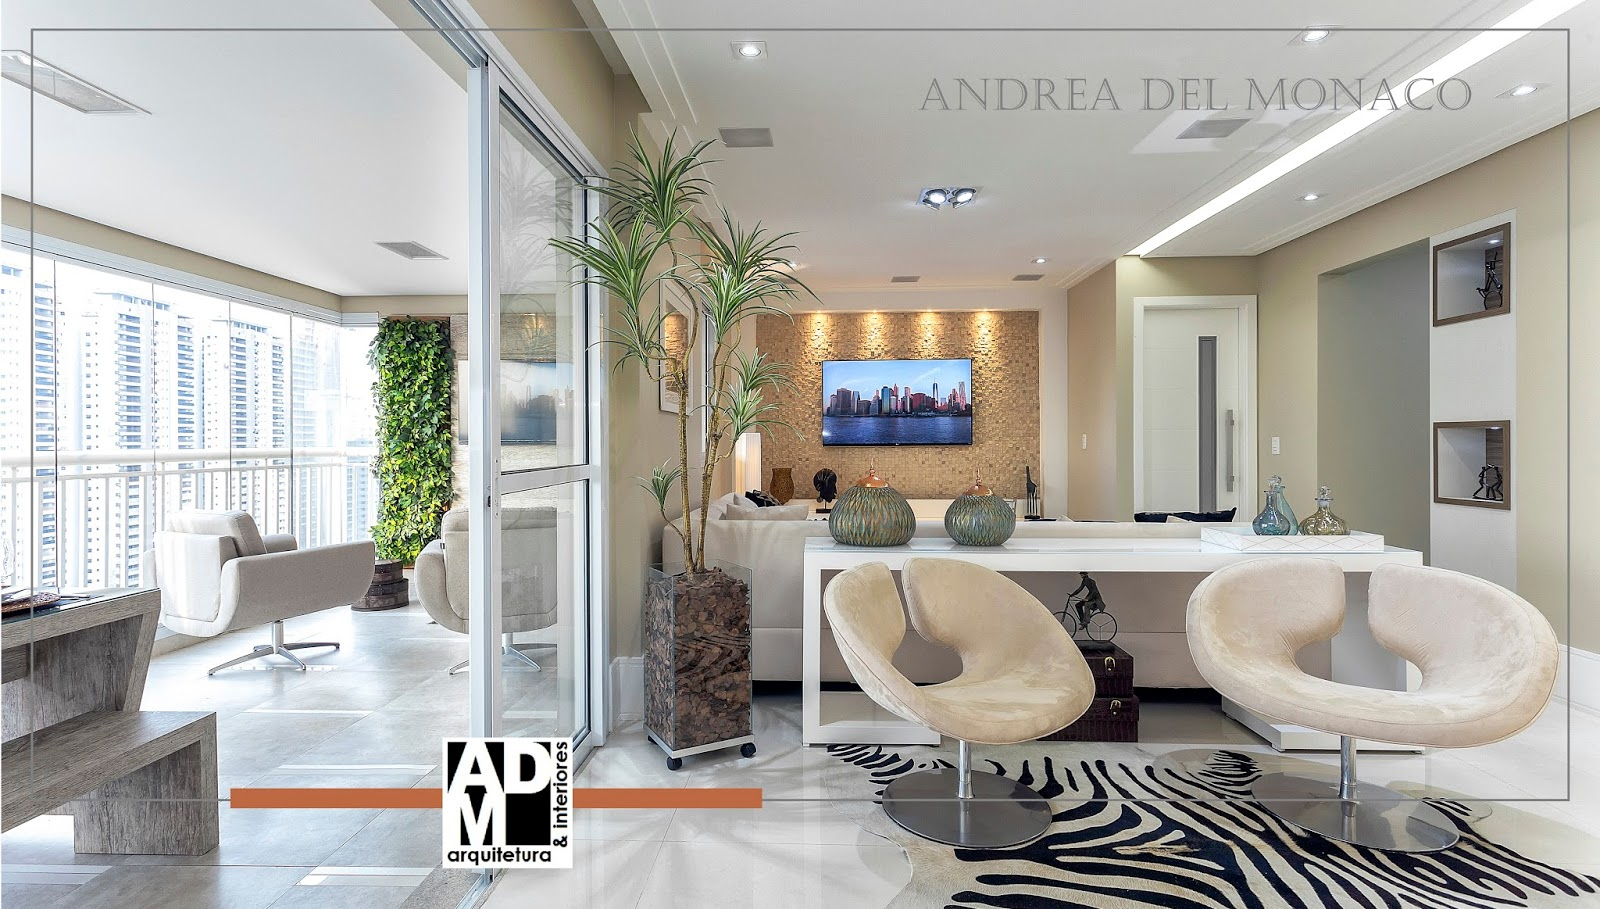 Andrea Del Monaco ADM arquitetura & interiores #995232 1600 909